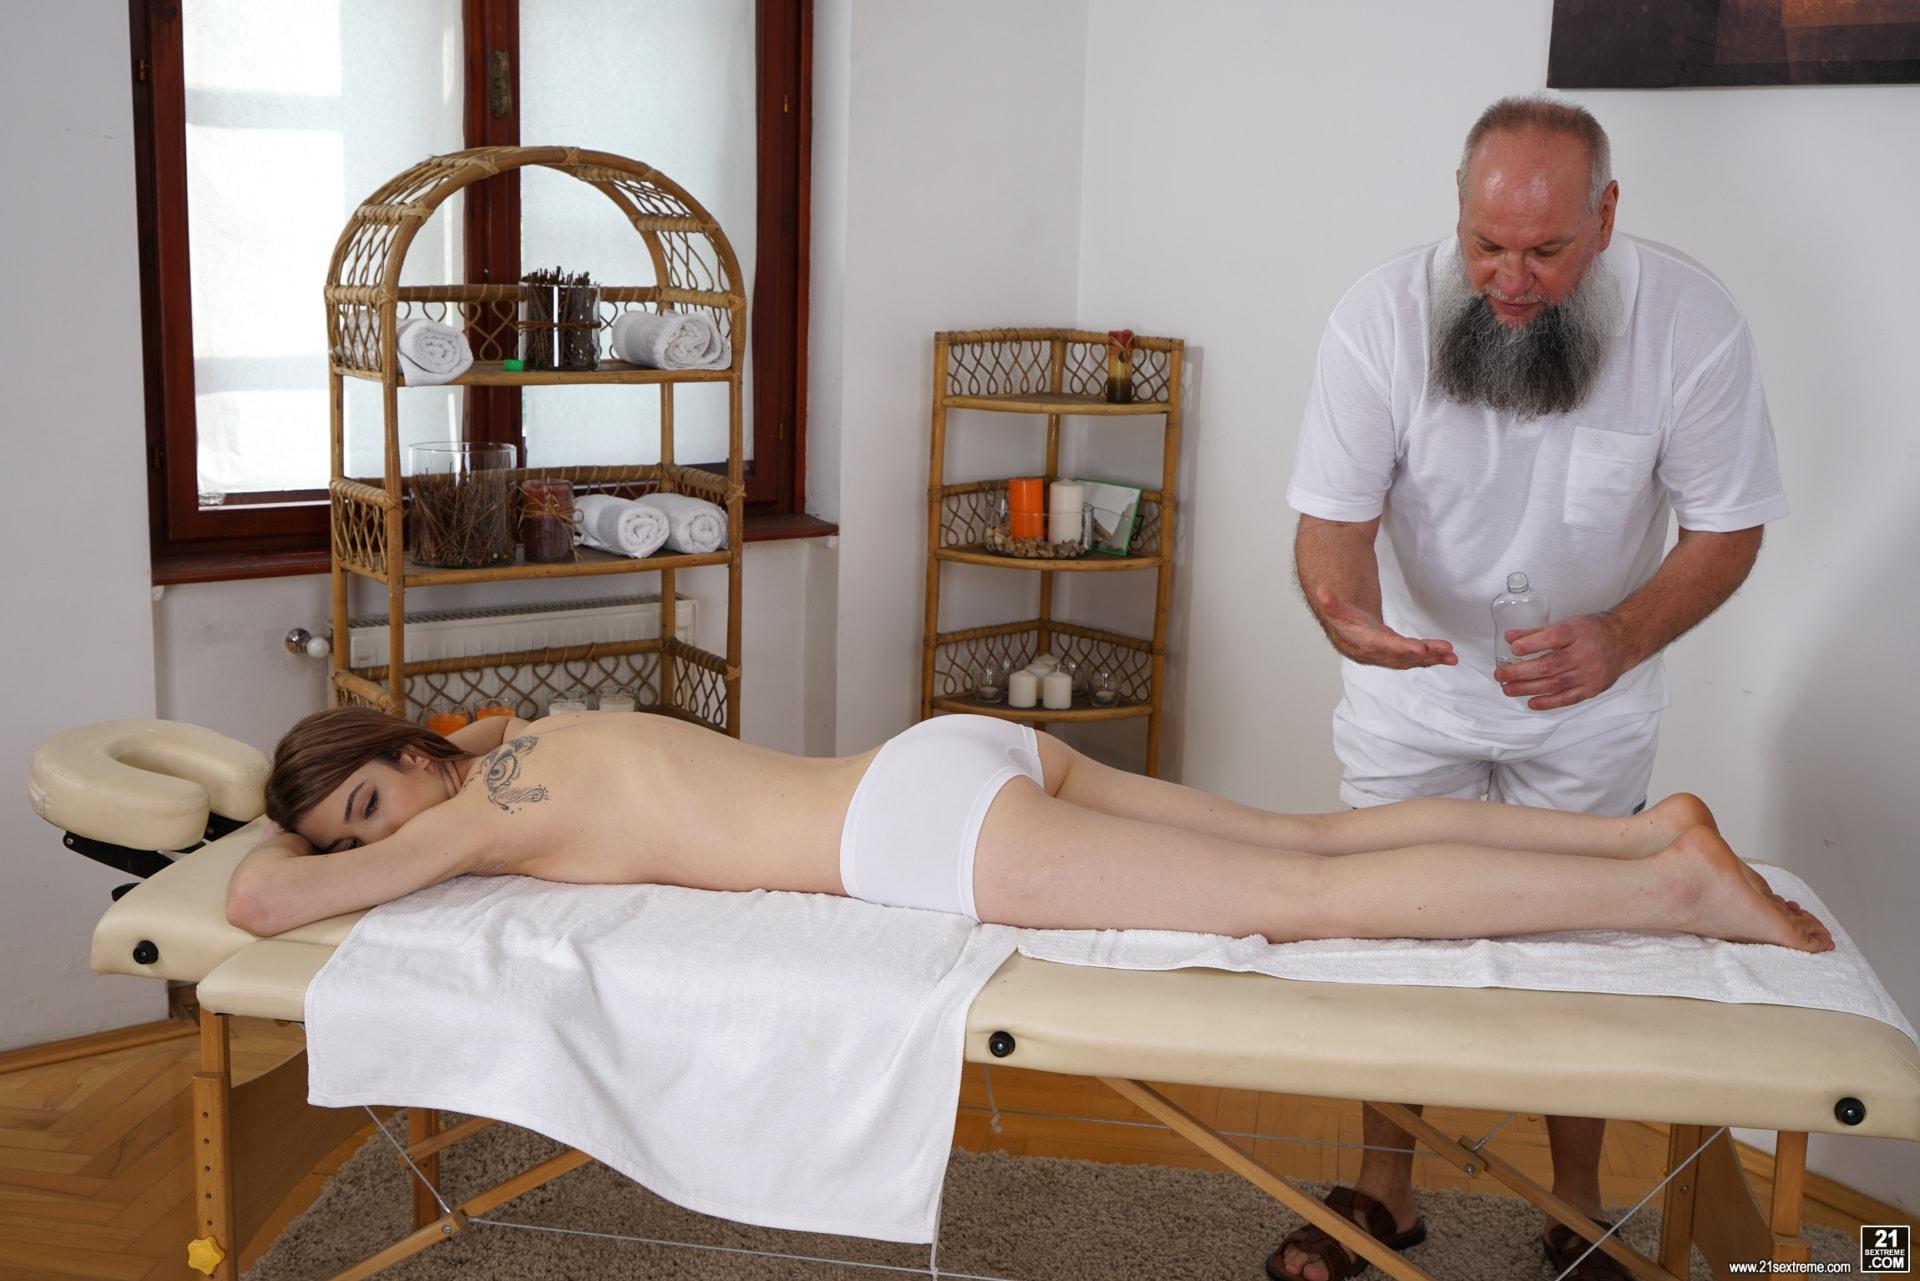 21Sextury 'Let Grandpa Massage You' starring Tera Link (Photo 34)